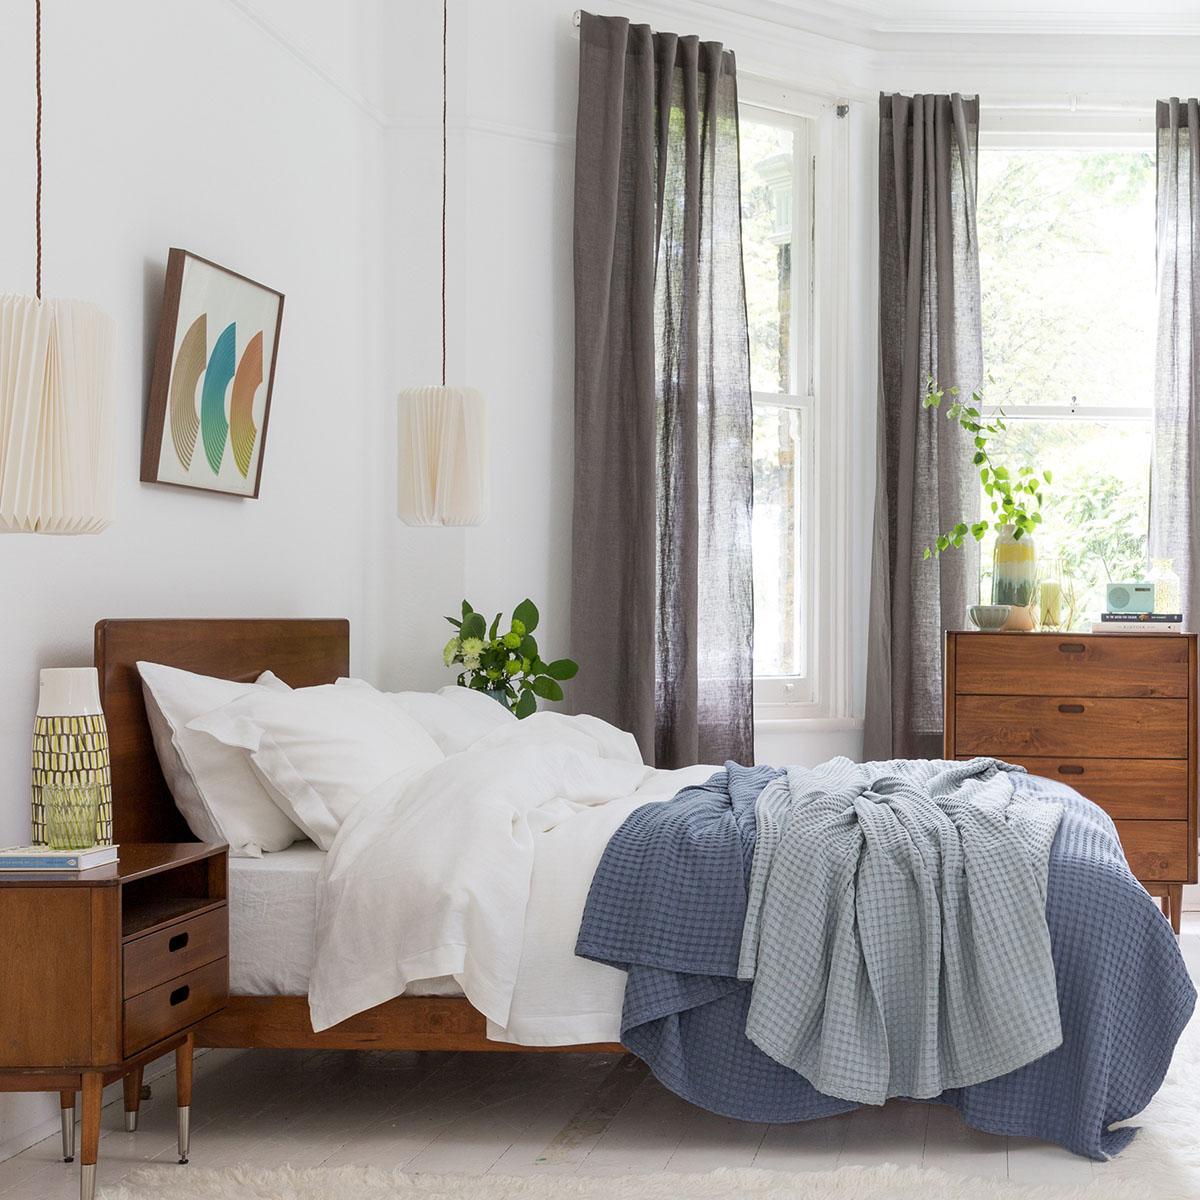 French Linen Bedding Bundles